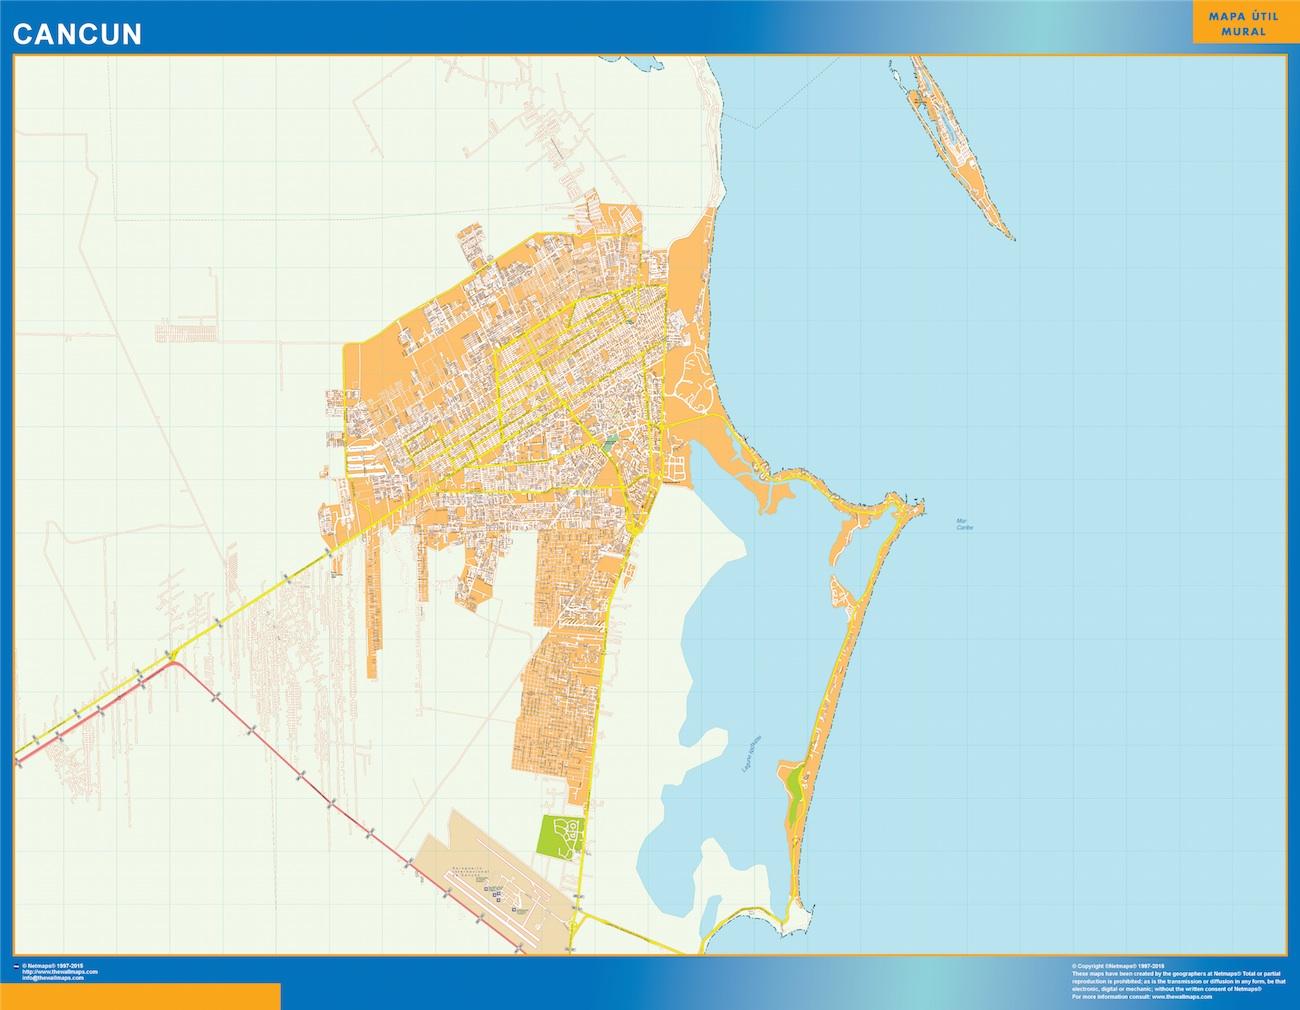 Mapa Cancun en Mexico plastificado gigante